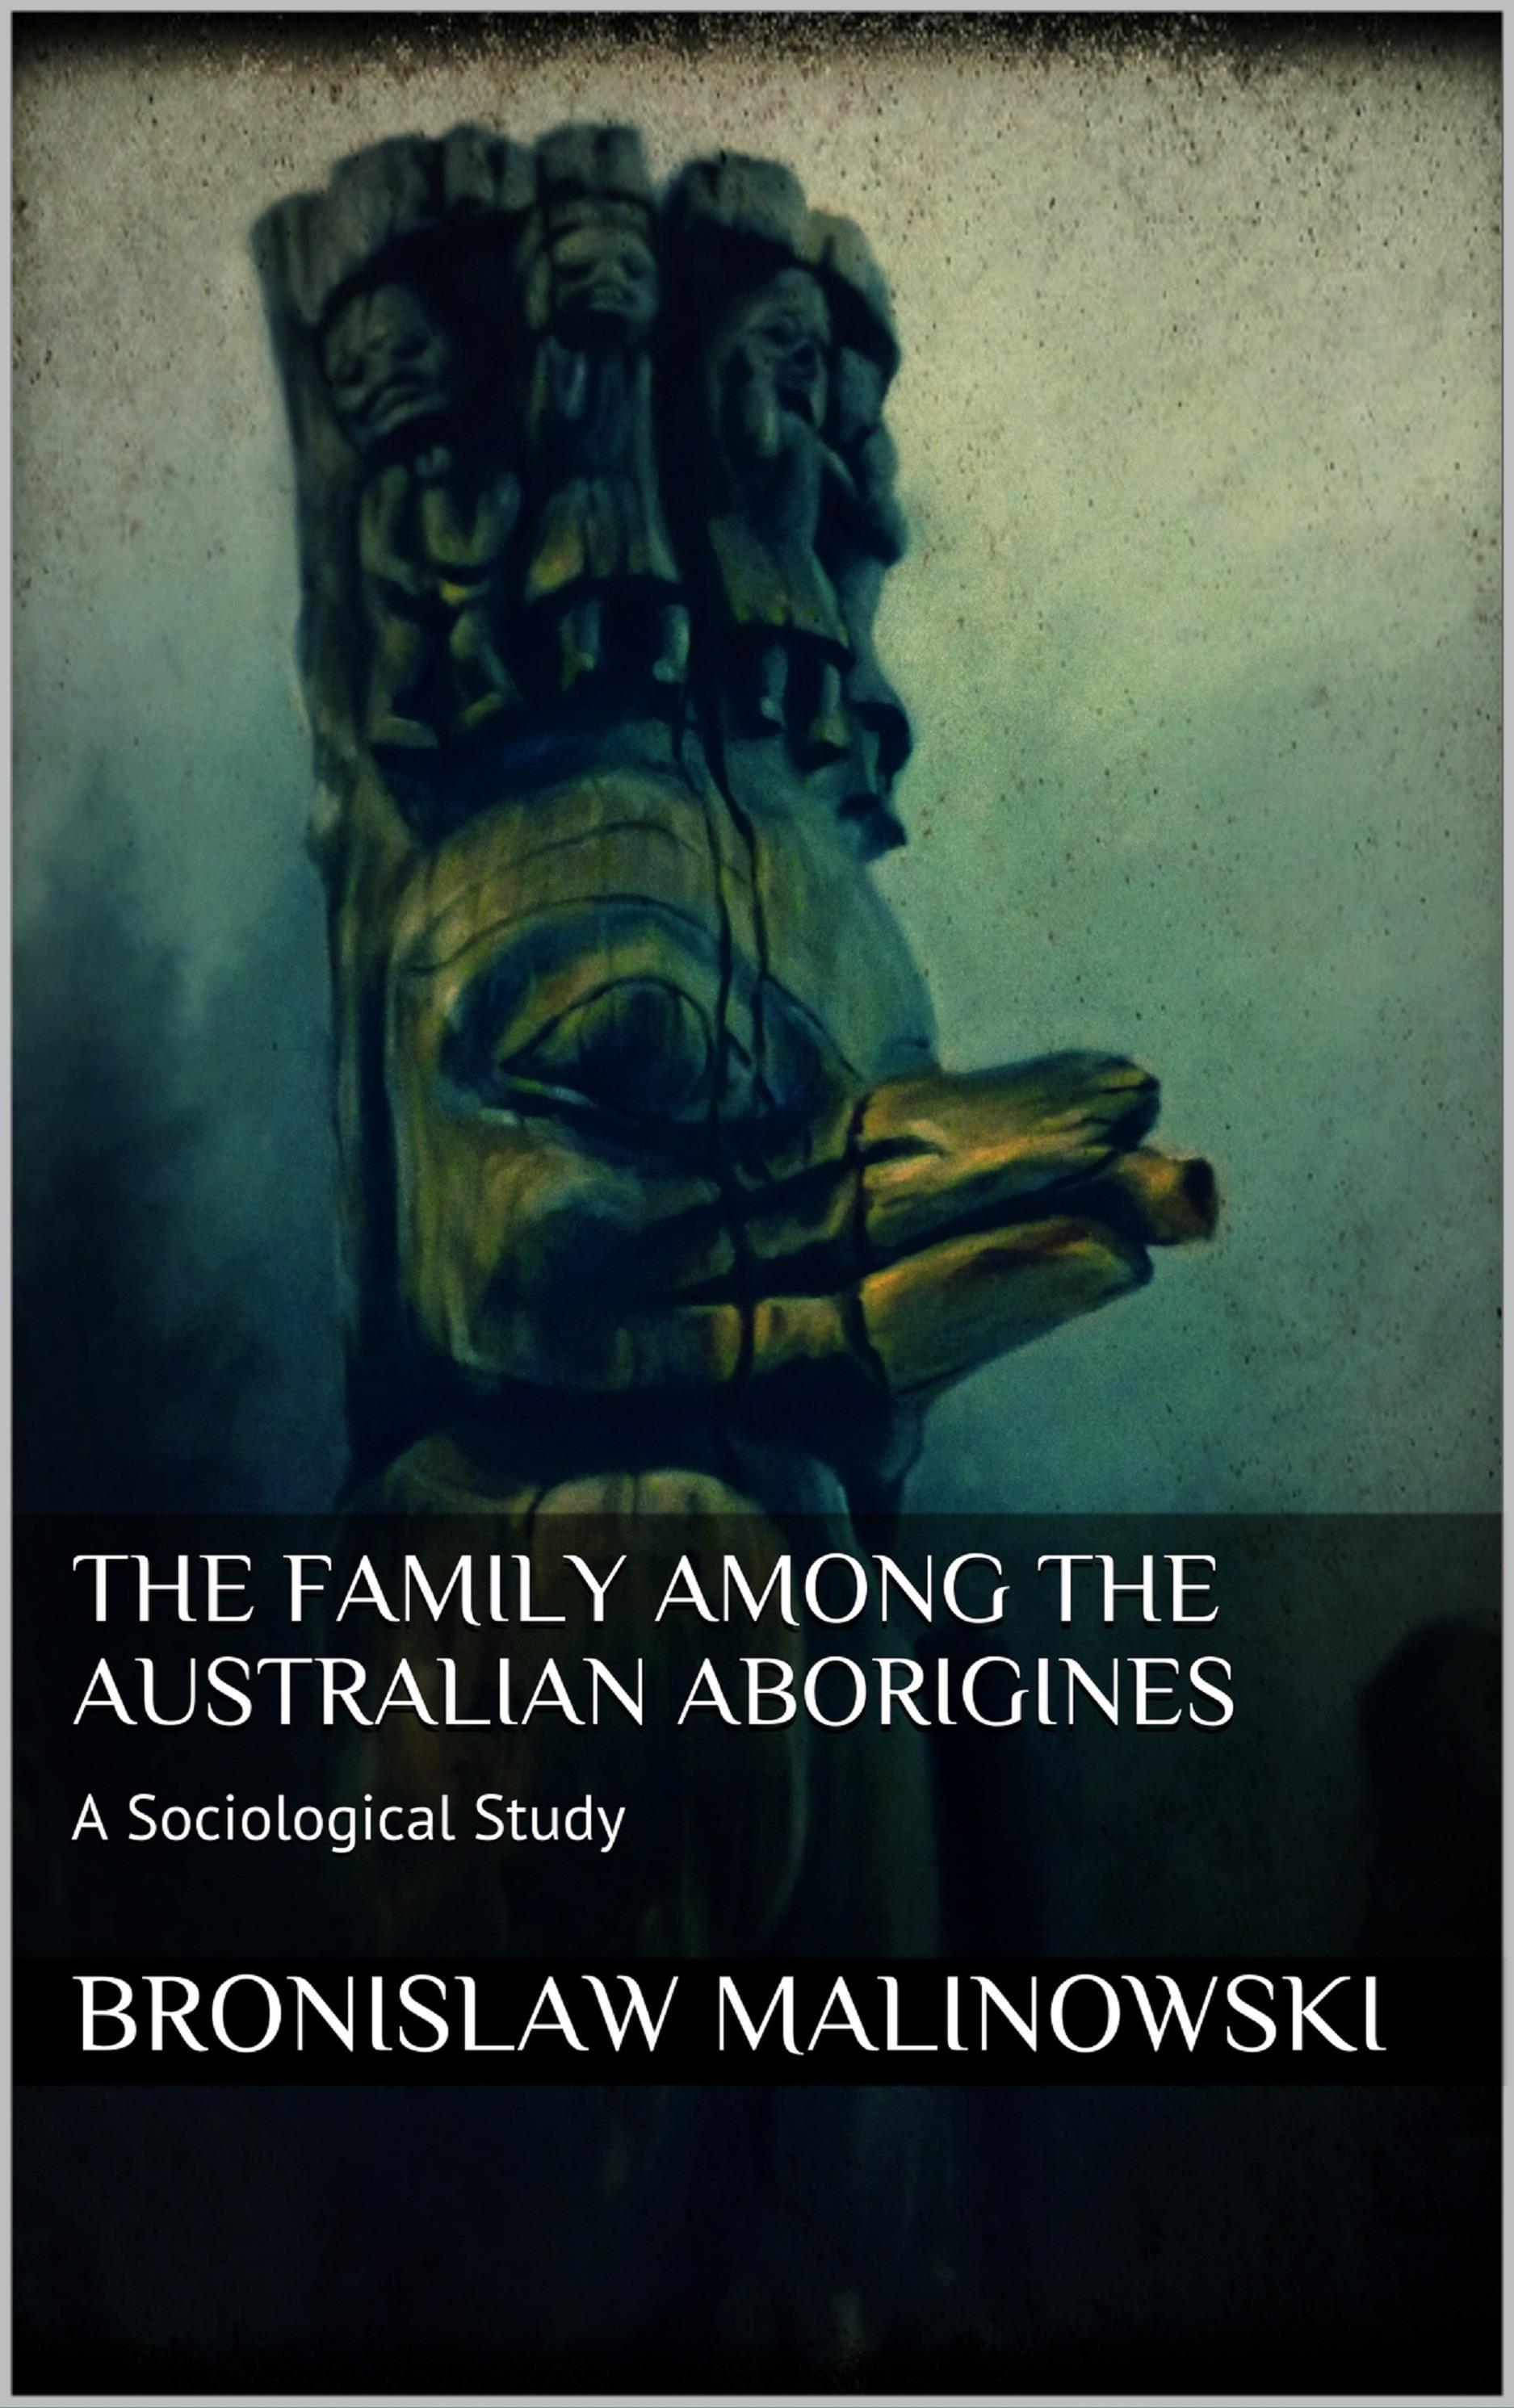 The Family among the Australian Aborigines